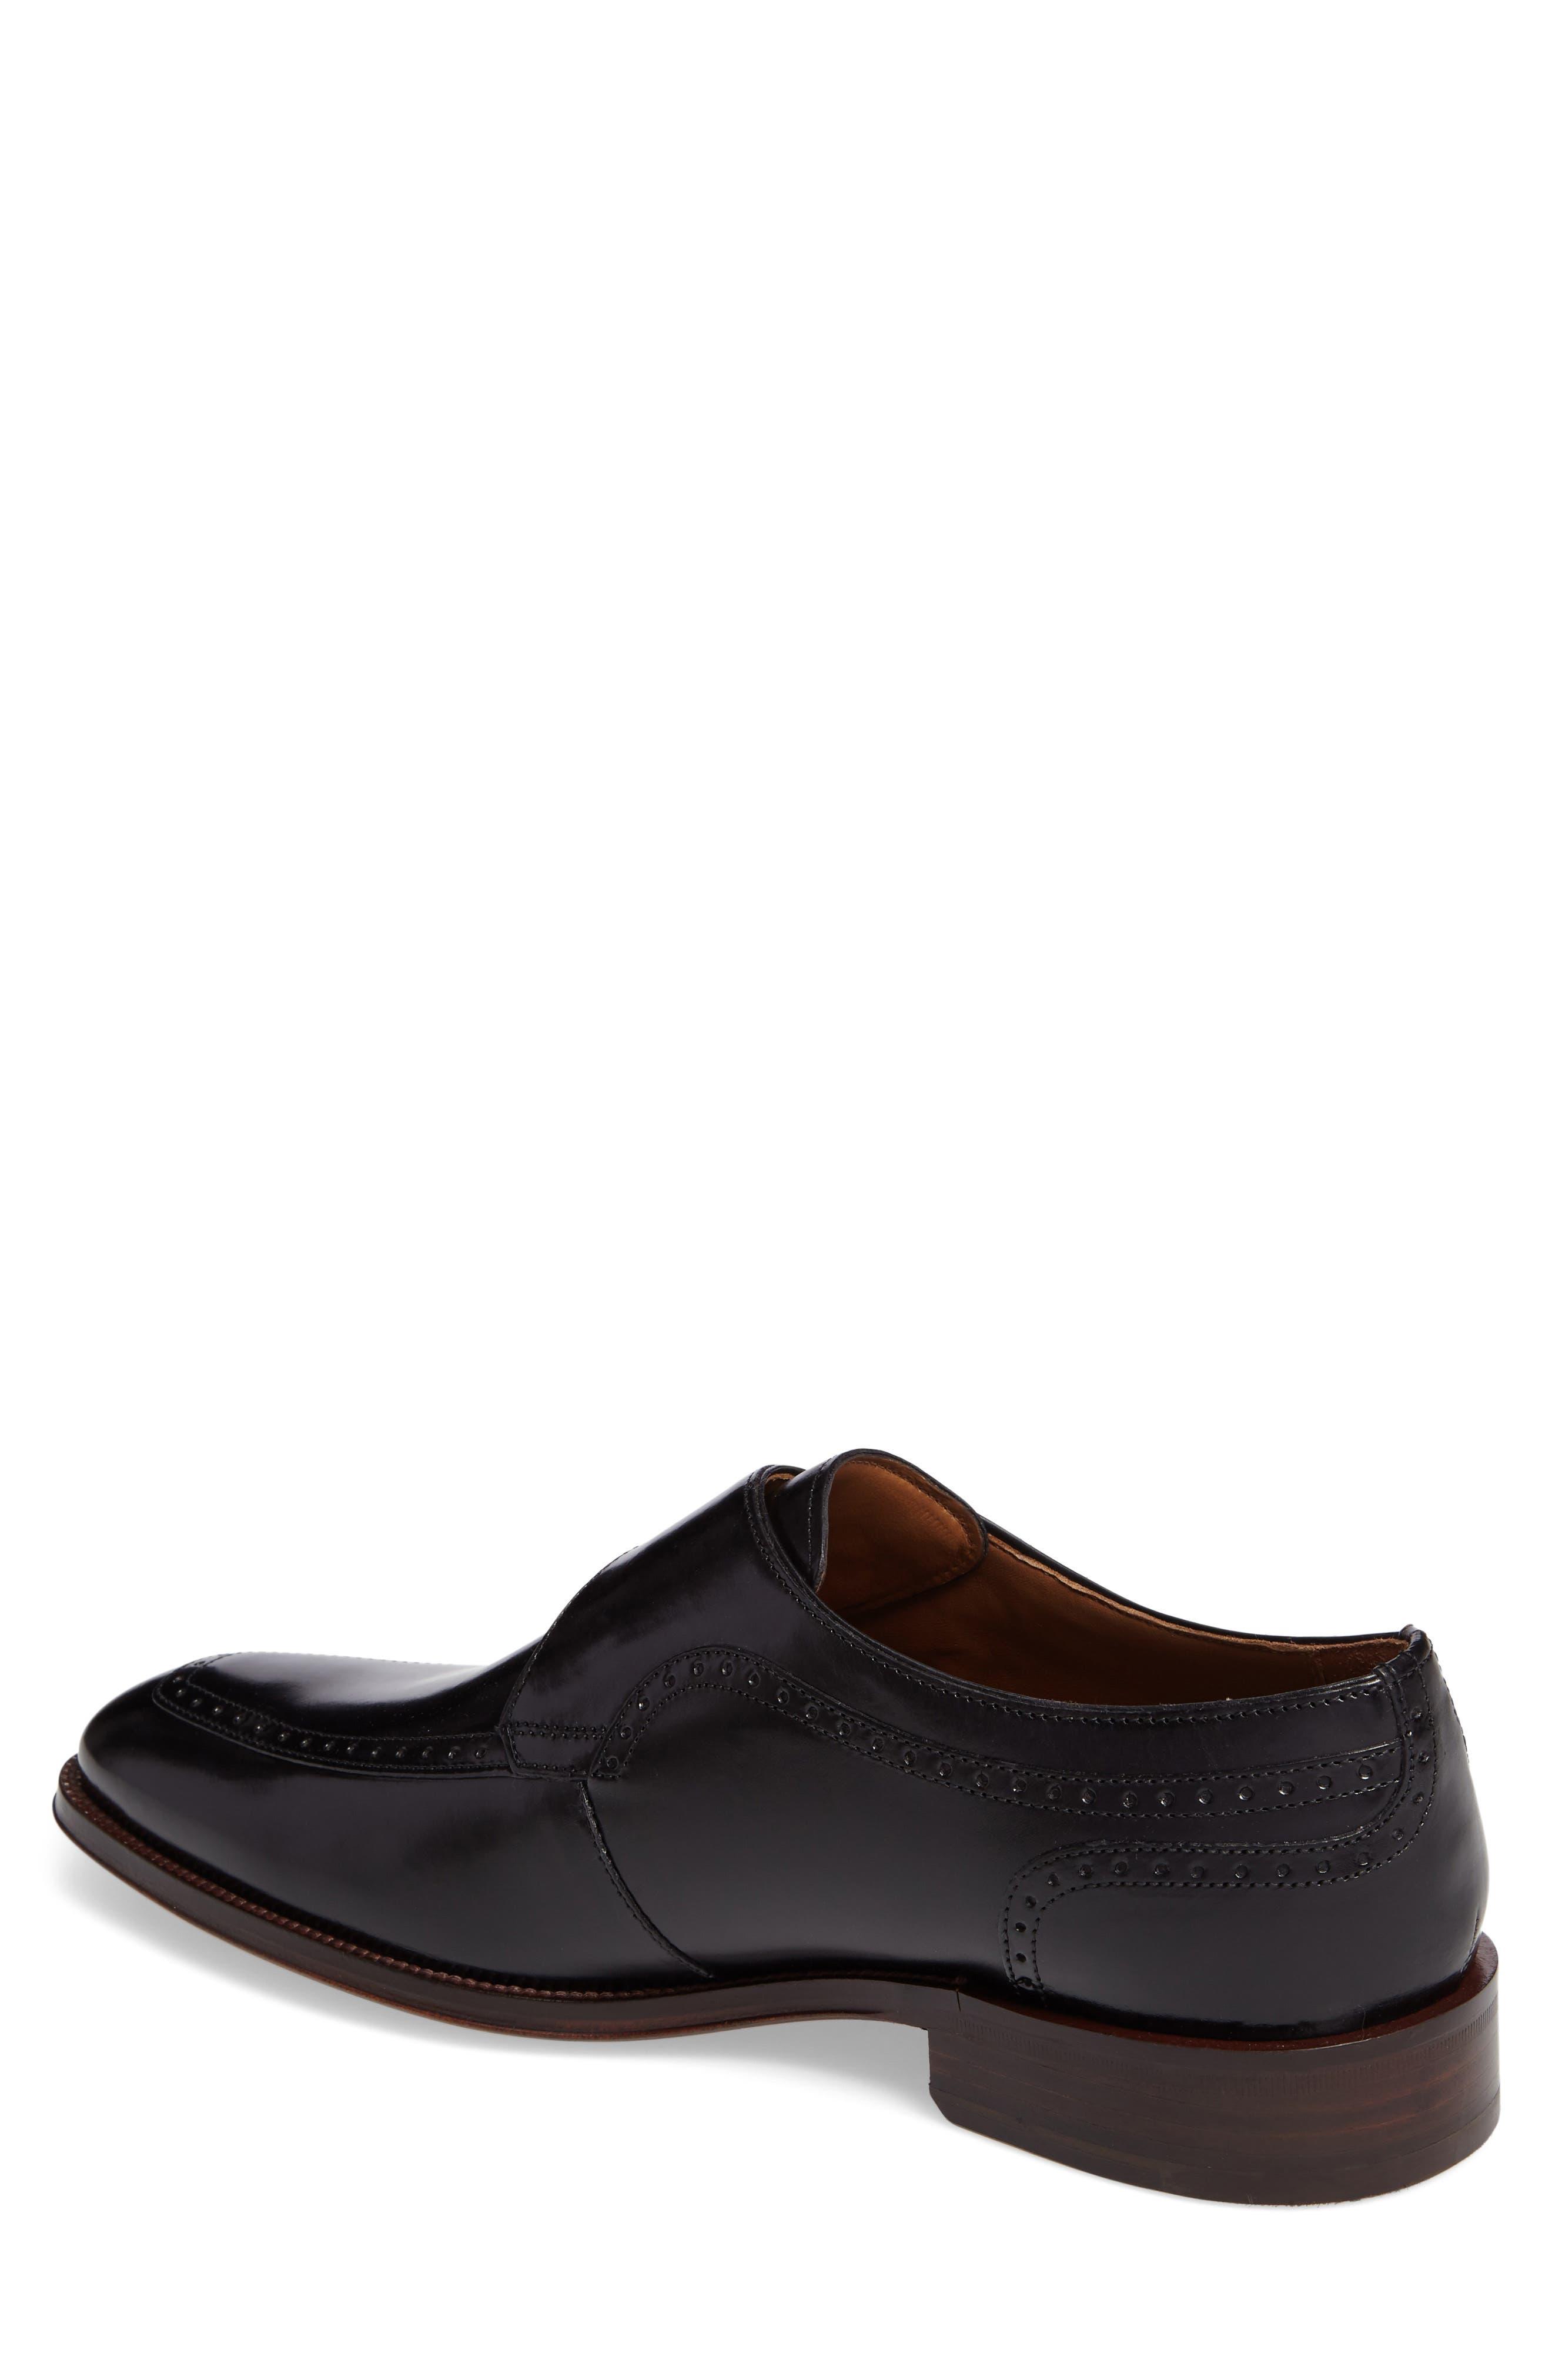 Boydstun Monk Strap Shoe,                             Alternate thumbnail 2, color,                             001